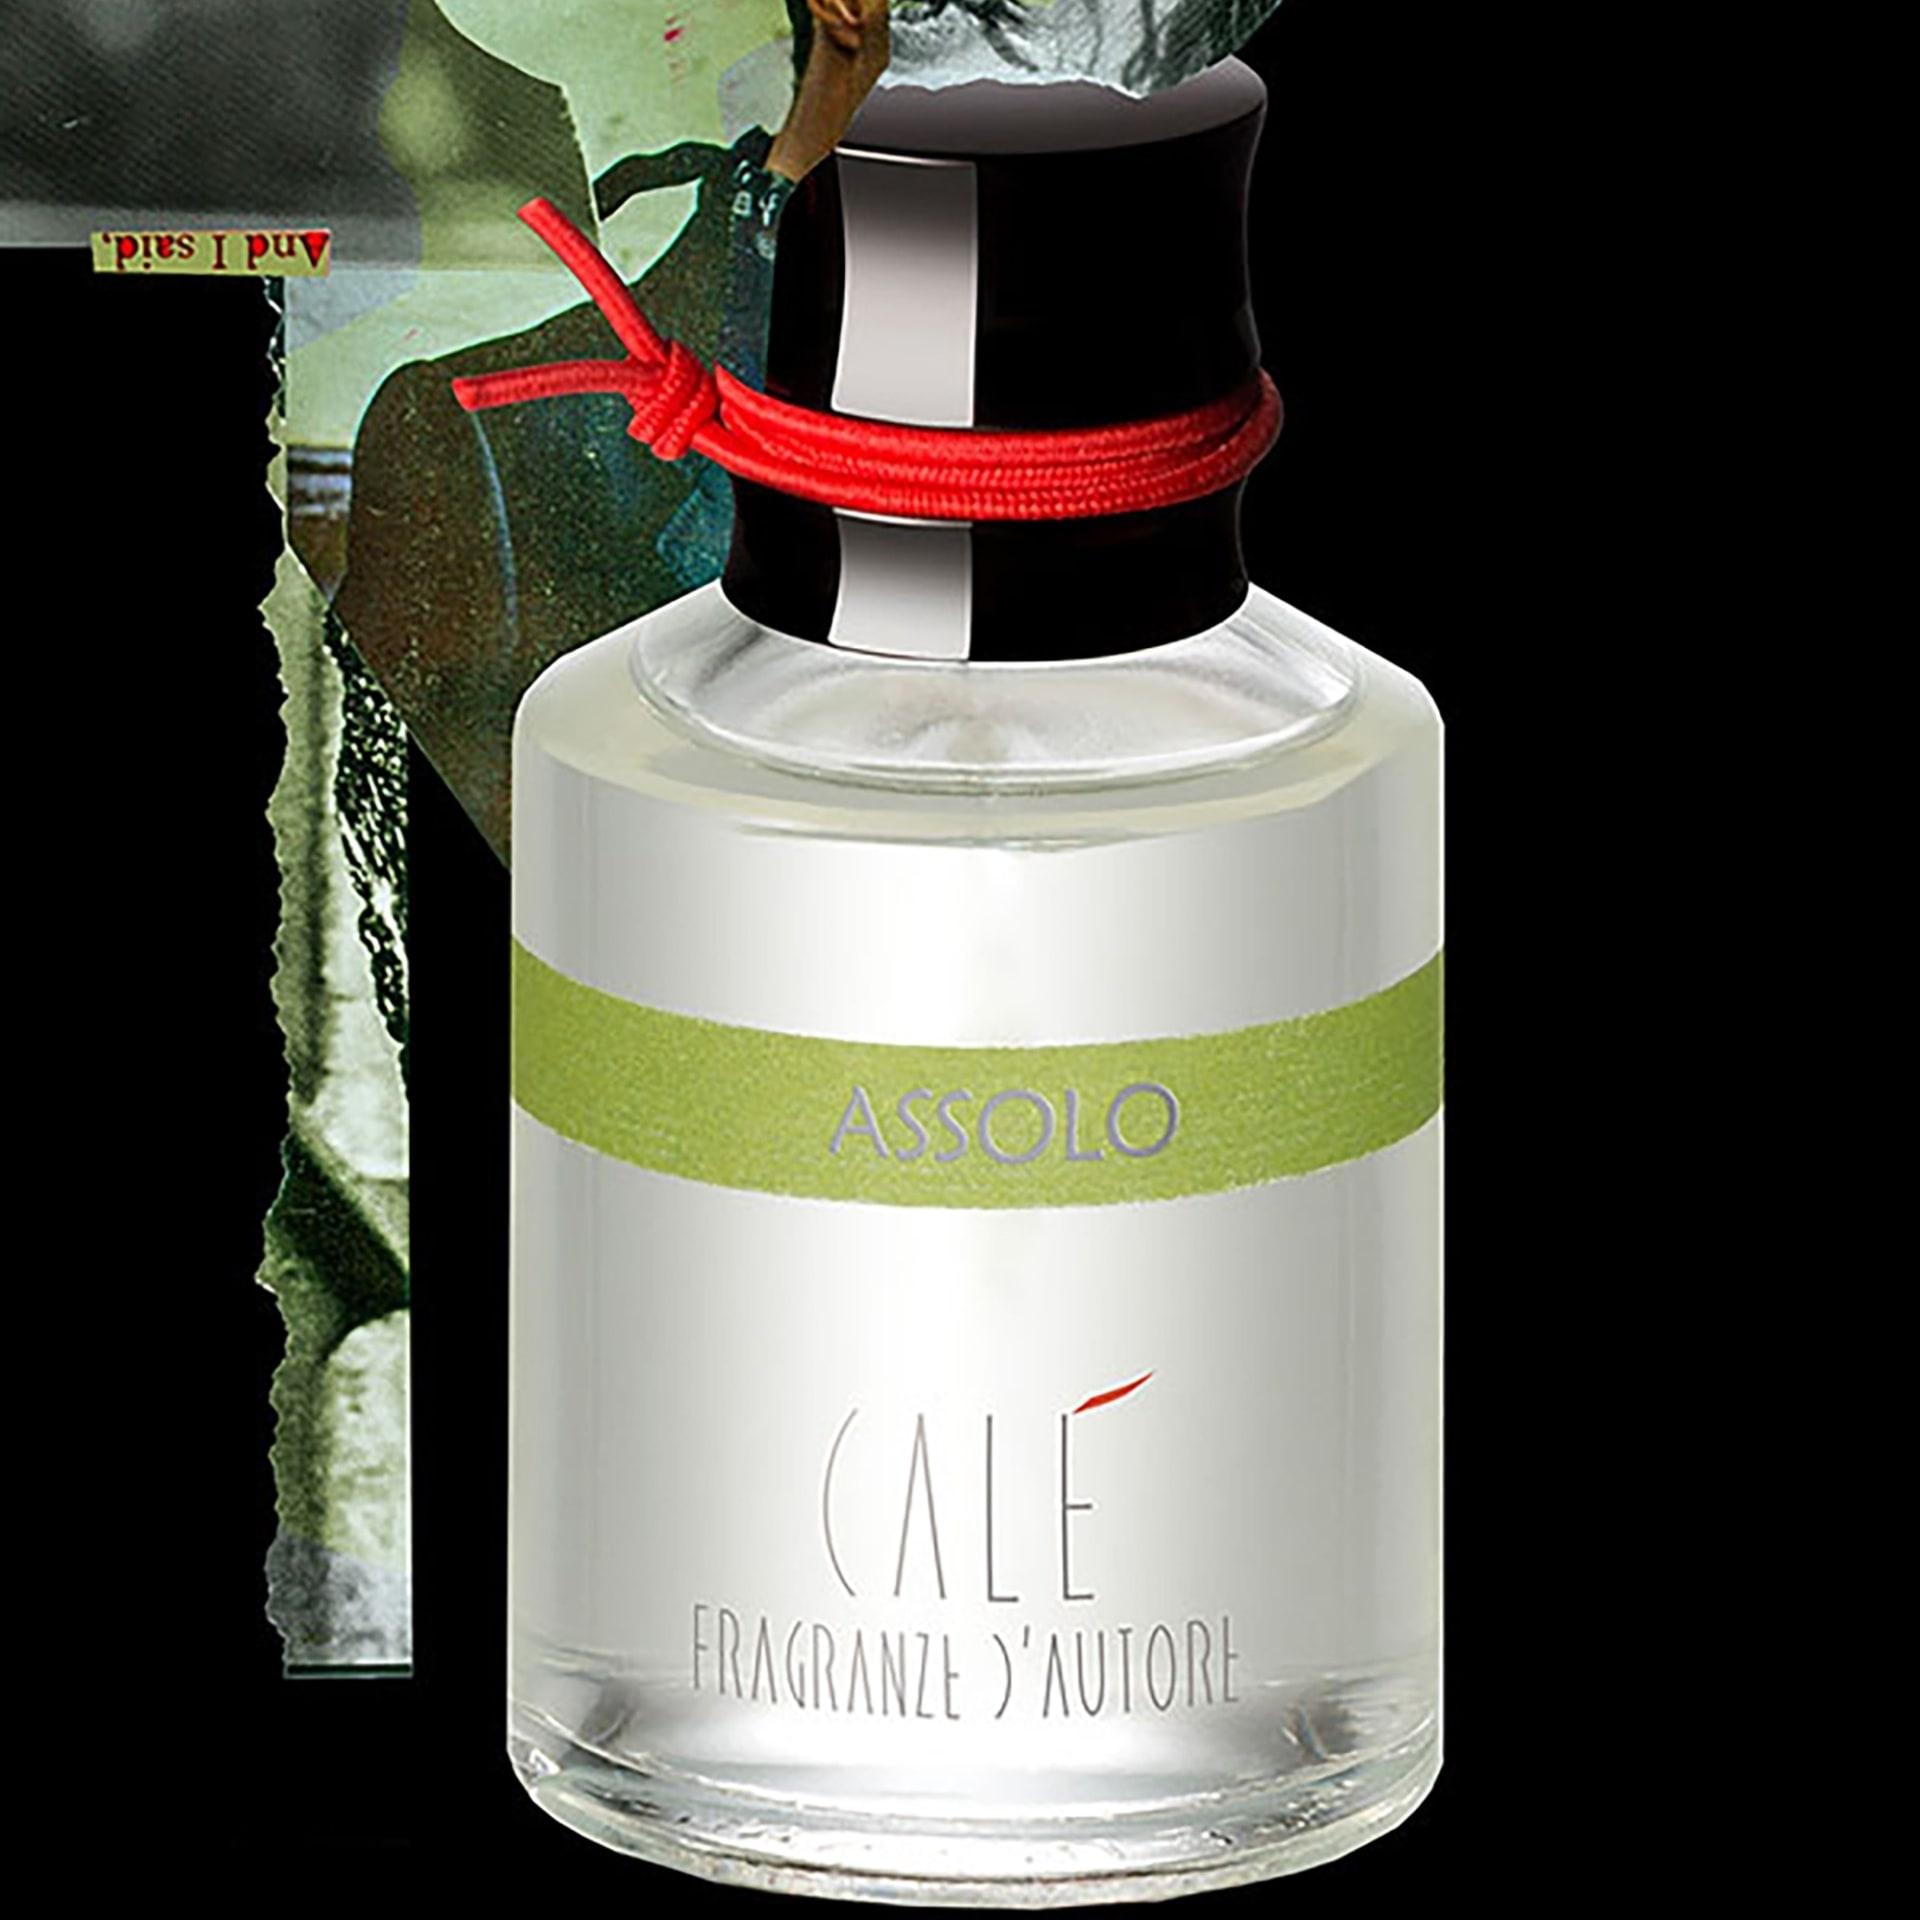 cale-fragranze-dautore-assolo-1